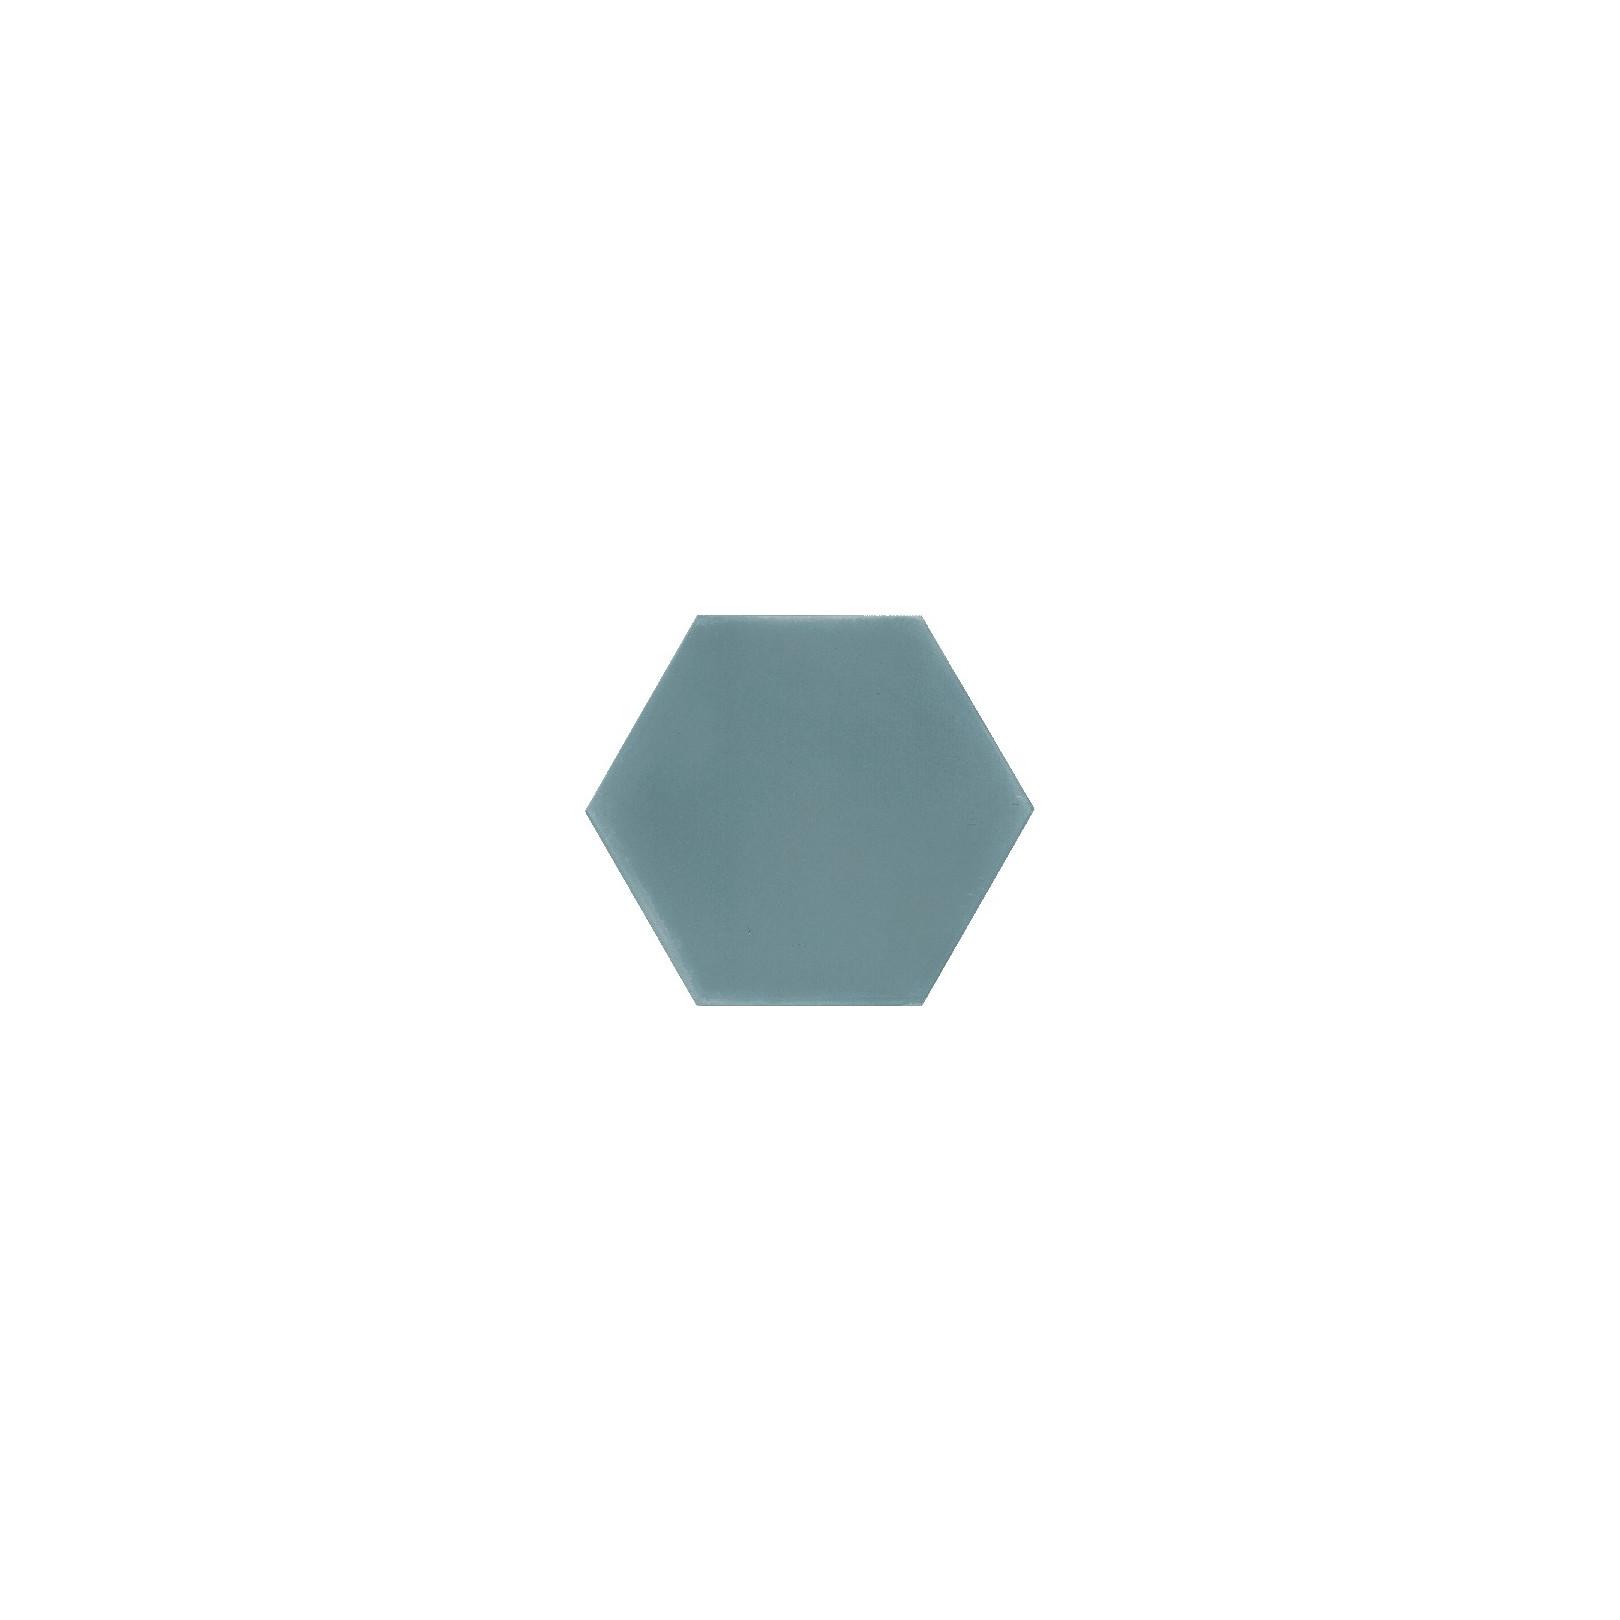 Ciment coloré Hexagone uni bleu vert HU39